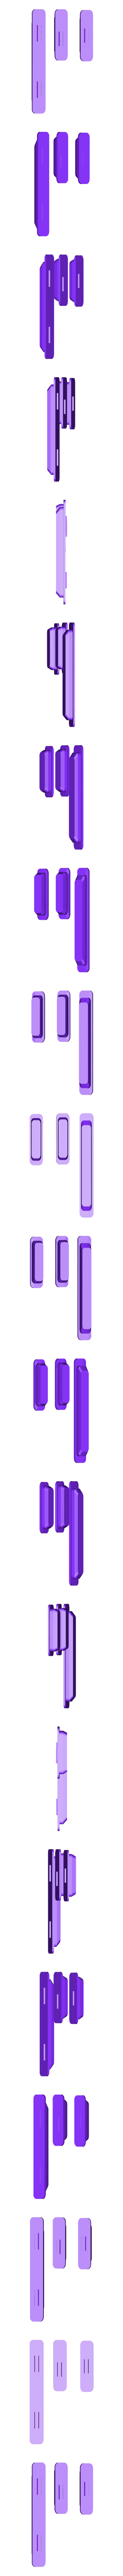 cova108_buttons.stl Download free STL file Fairphone 2 cover • 3D printer model, unwohlpol